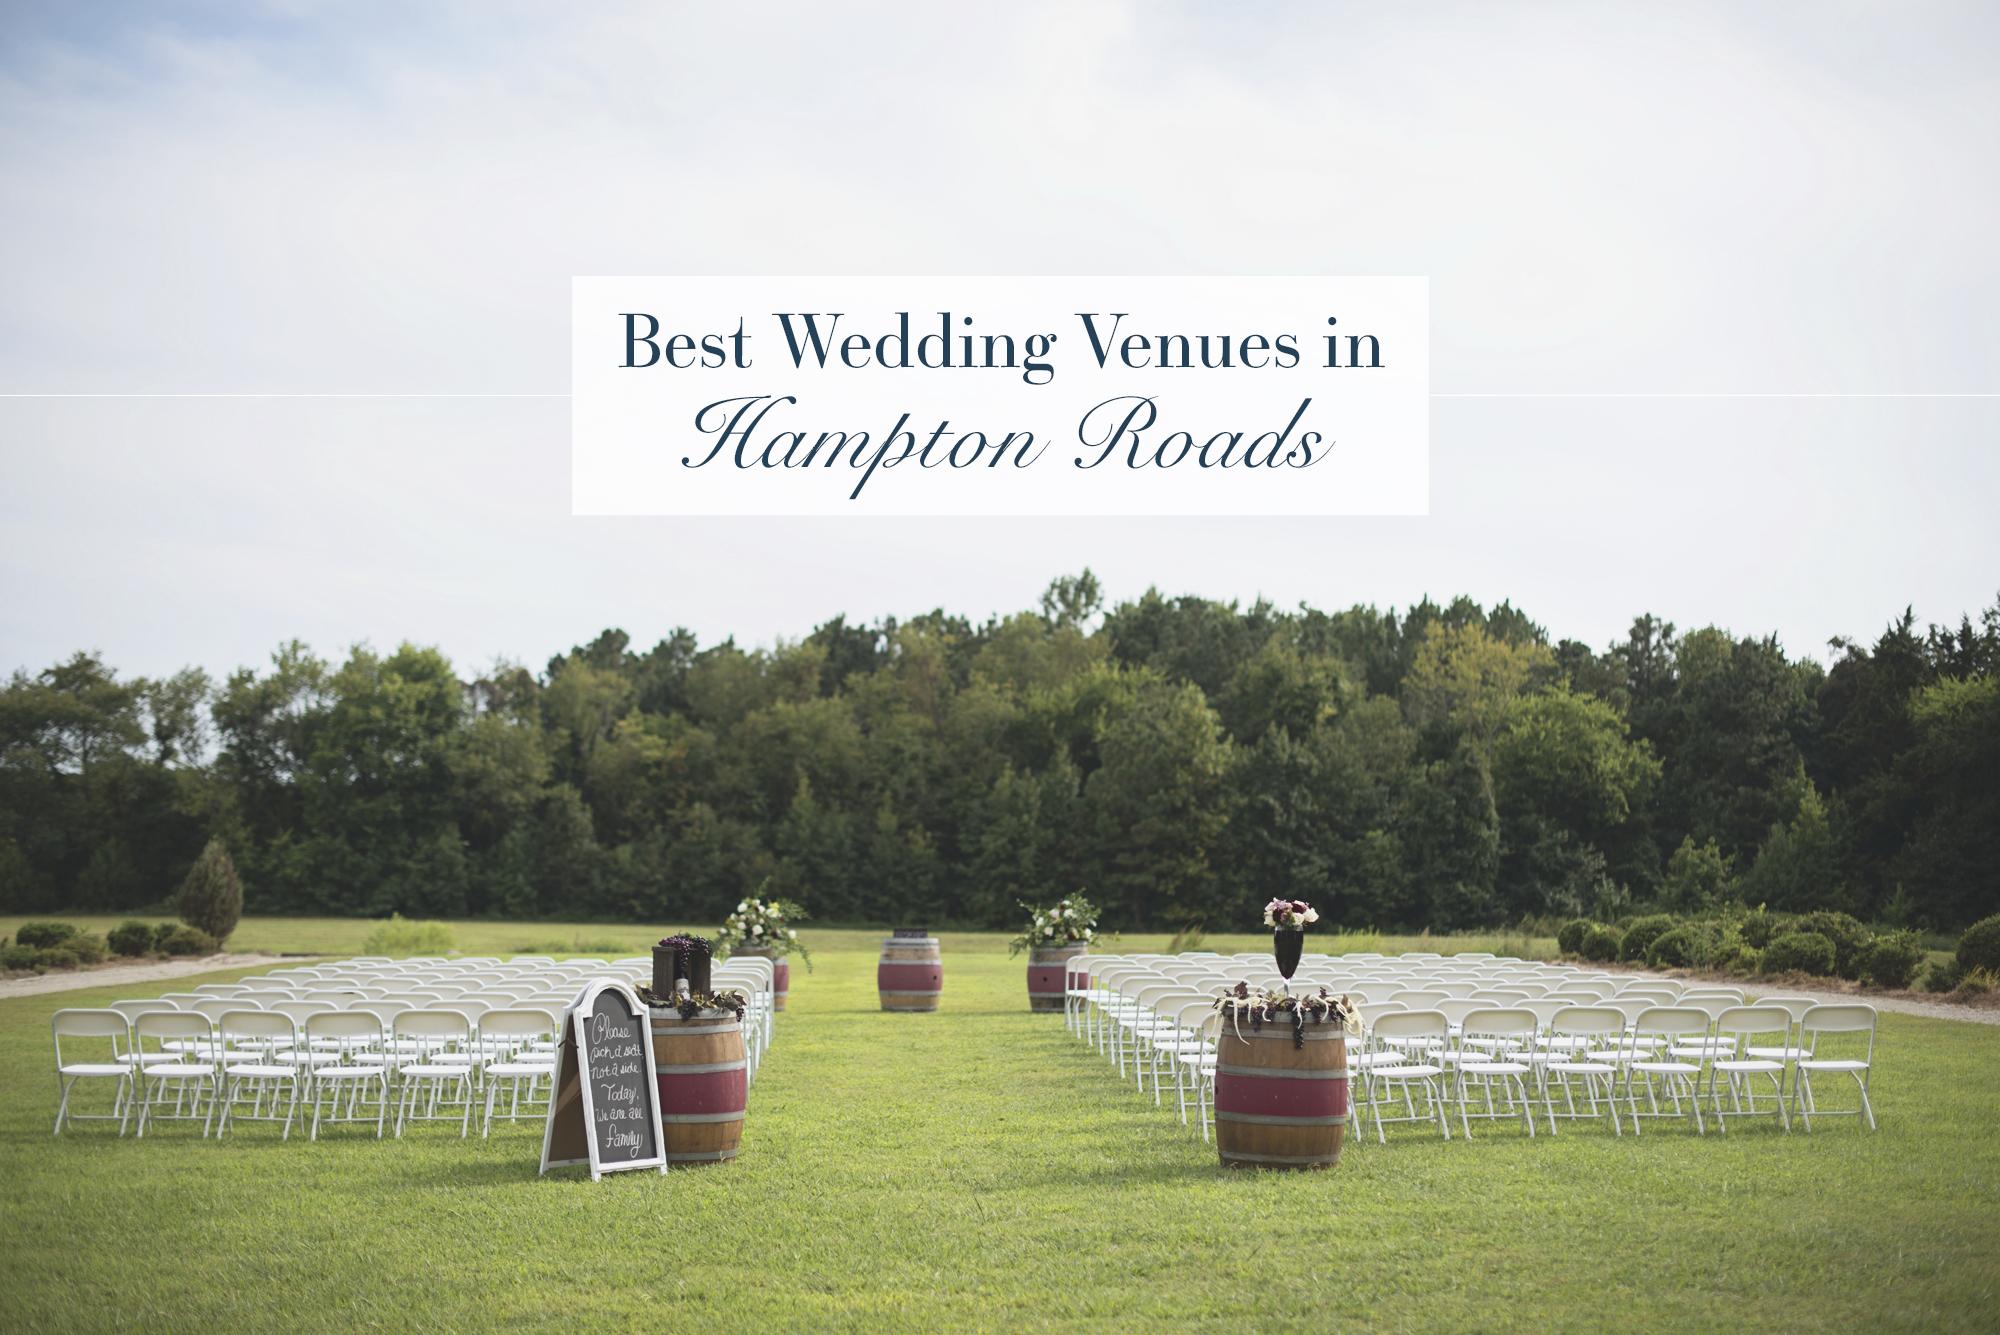 The Best Wedding Venues in Hampton Roads | Business